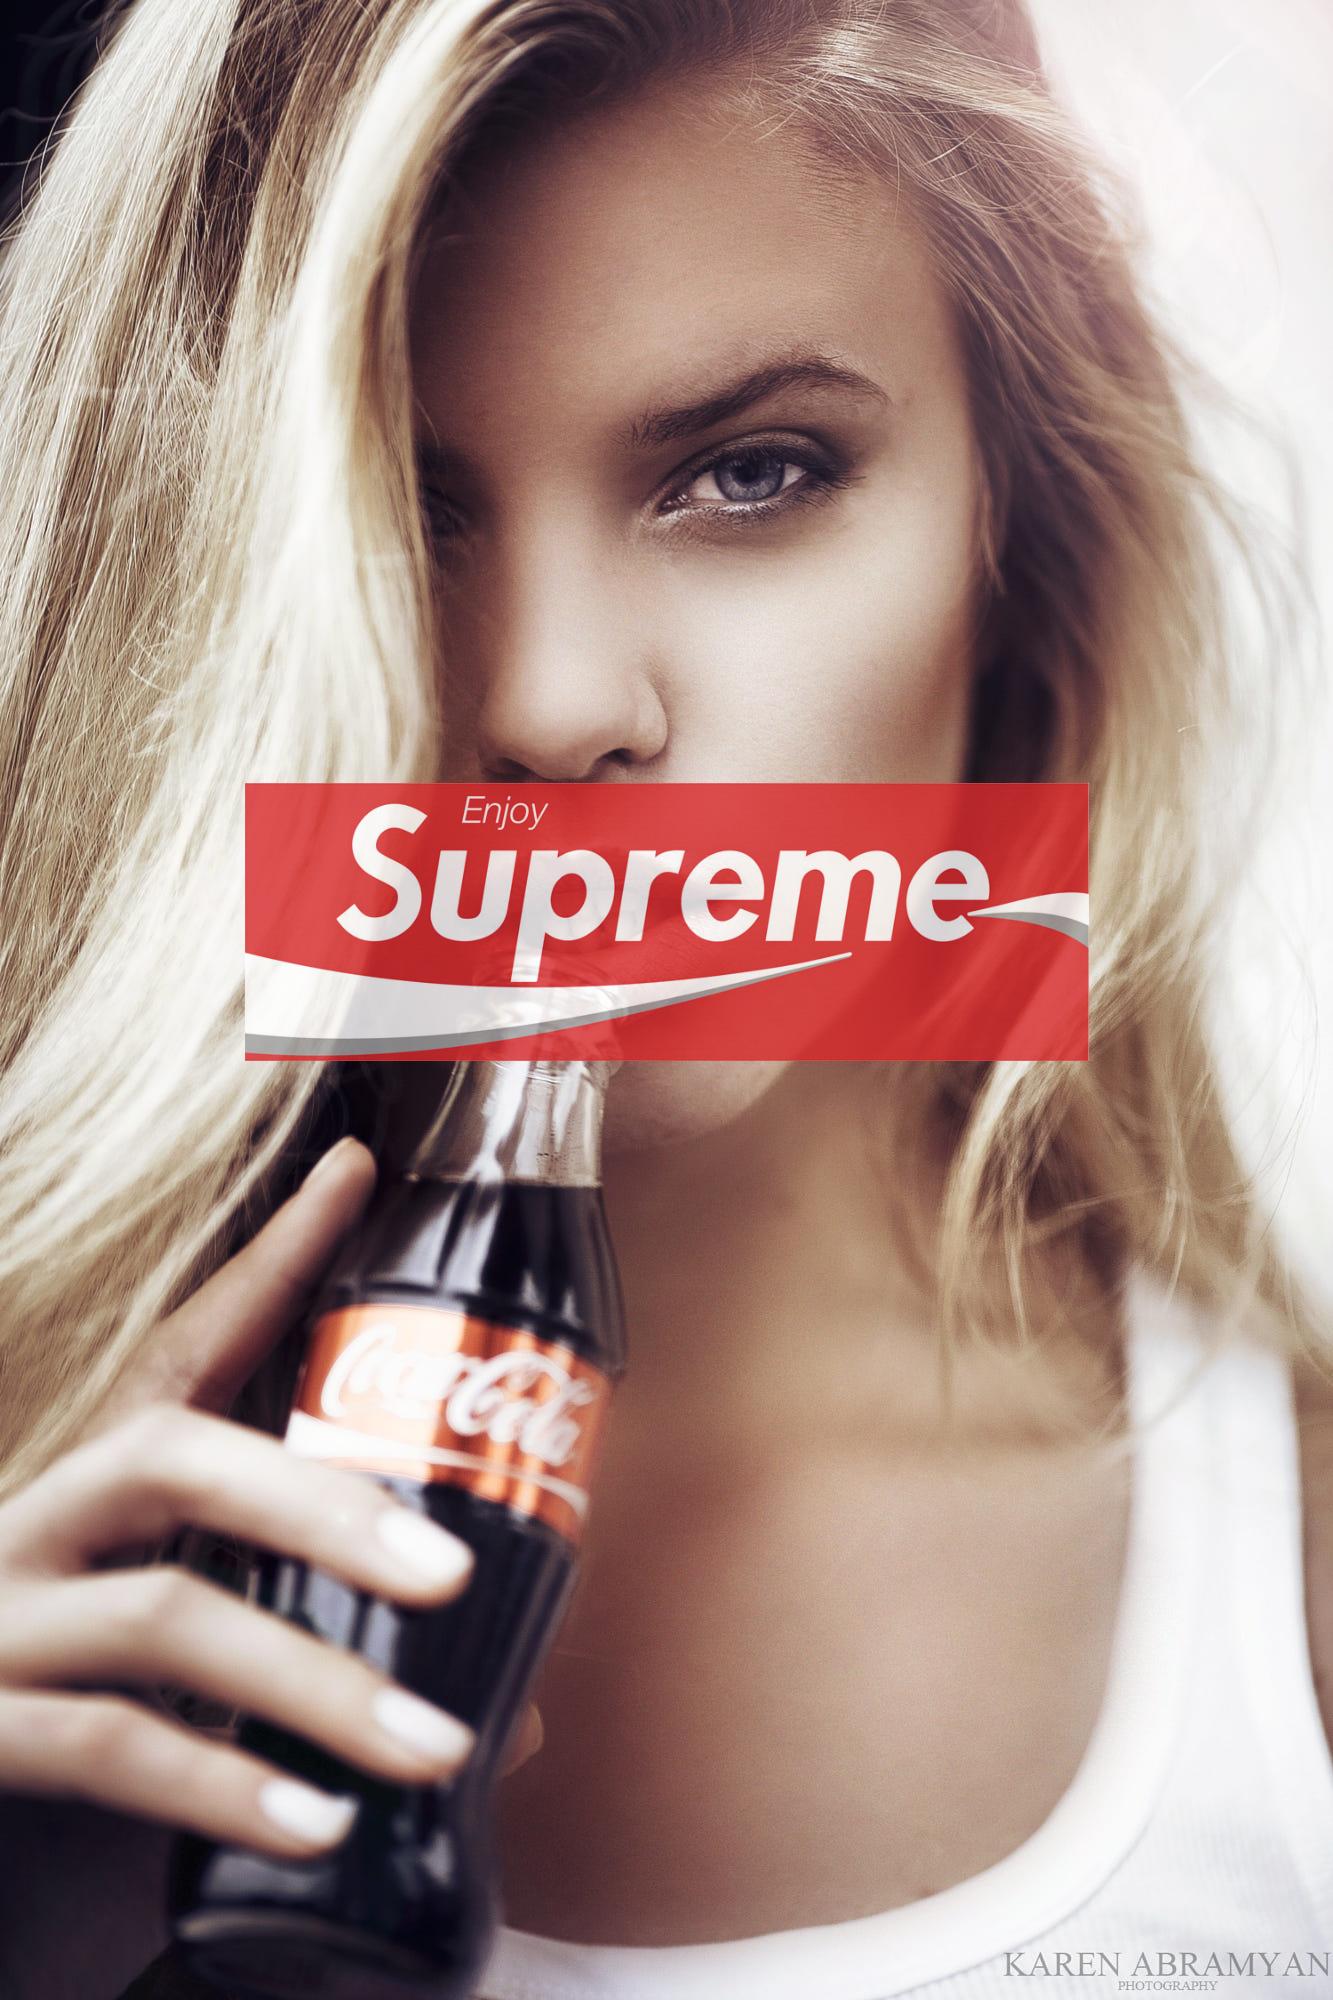 Supreme Coke Girl iPhone Wallpaper in 2019 Supreme